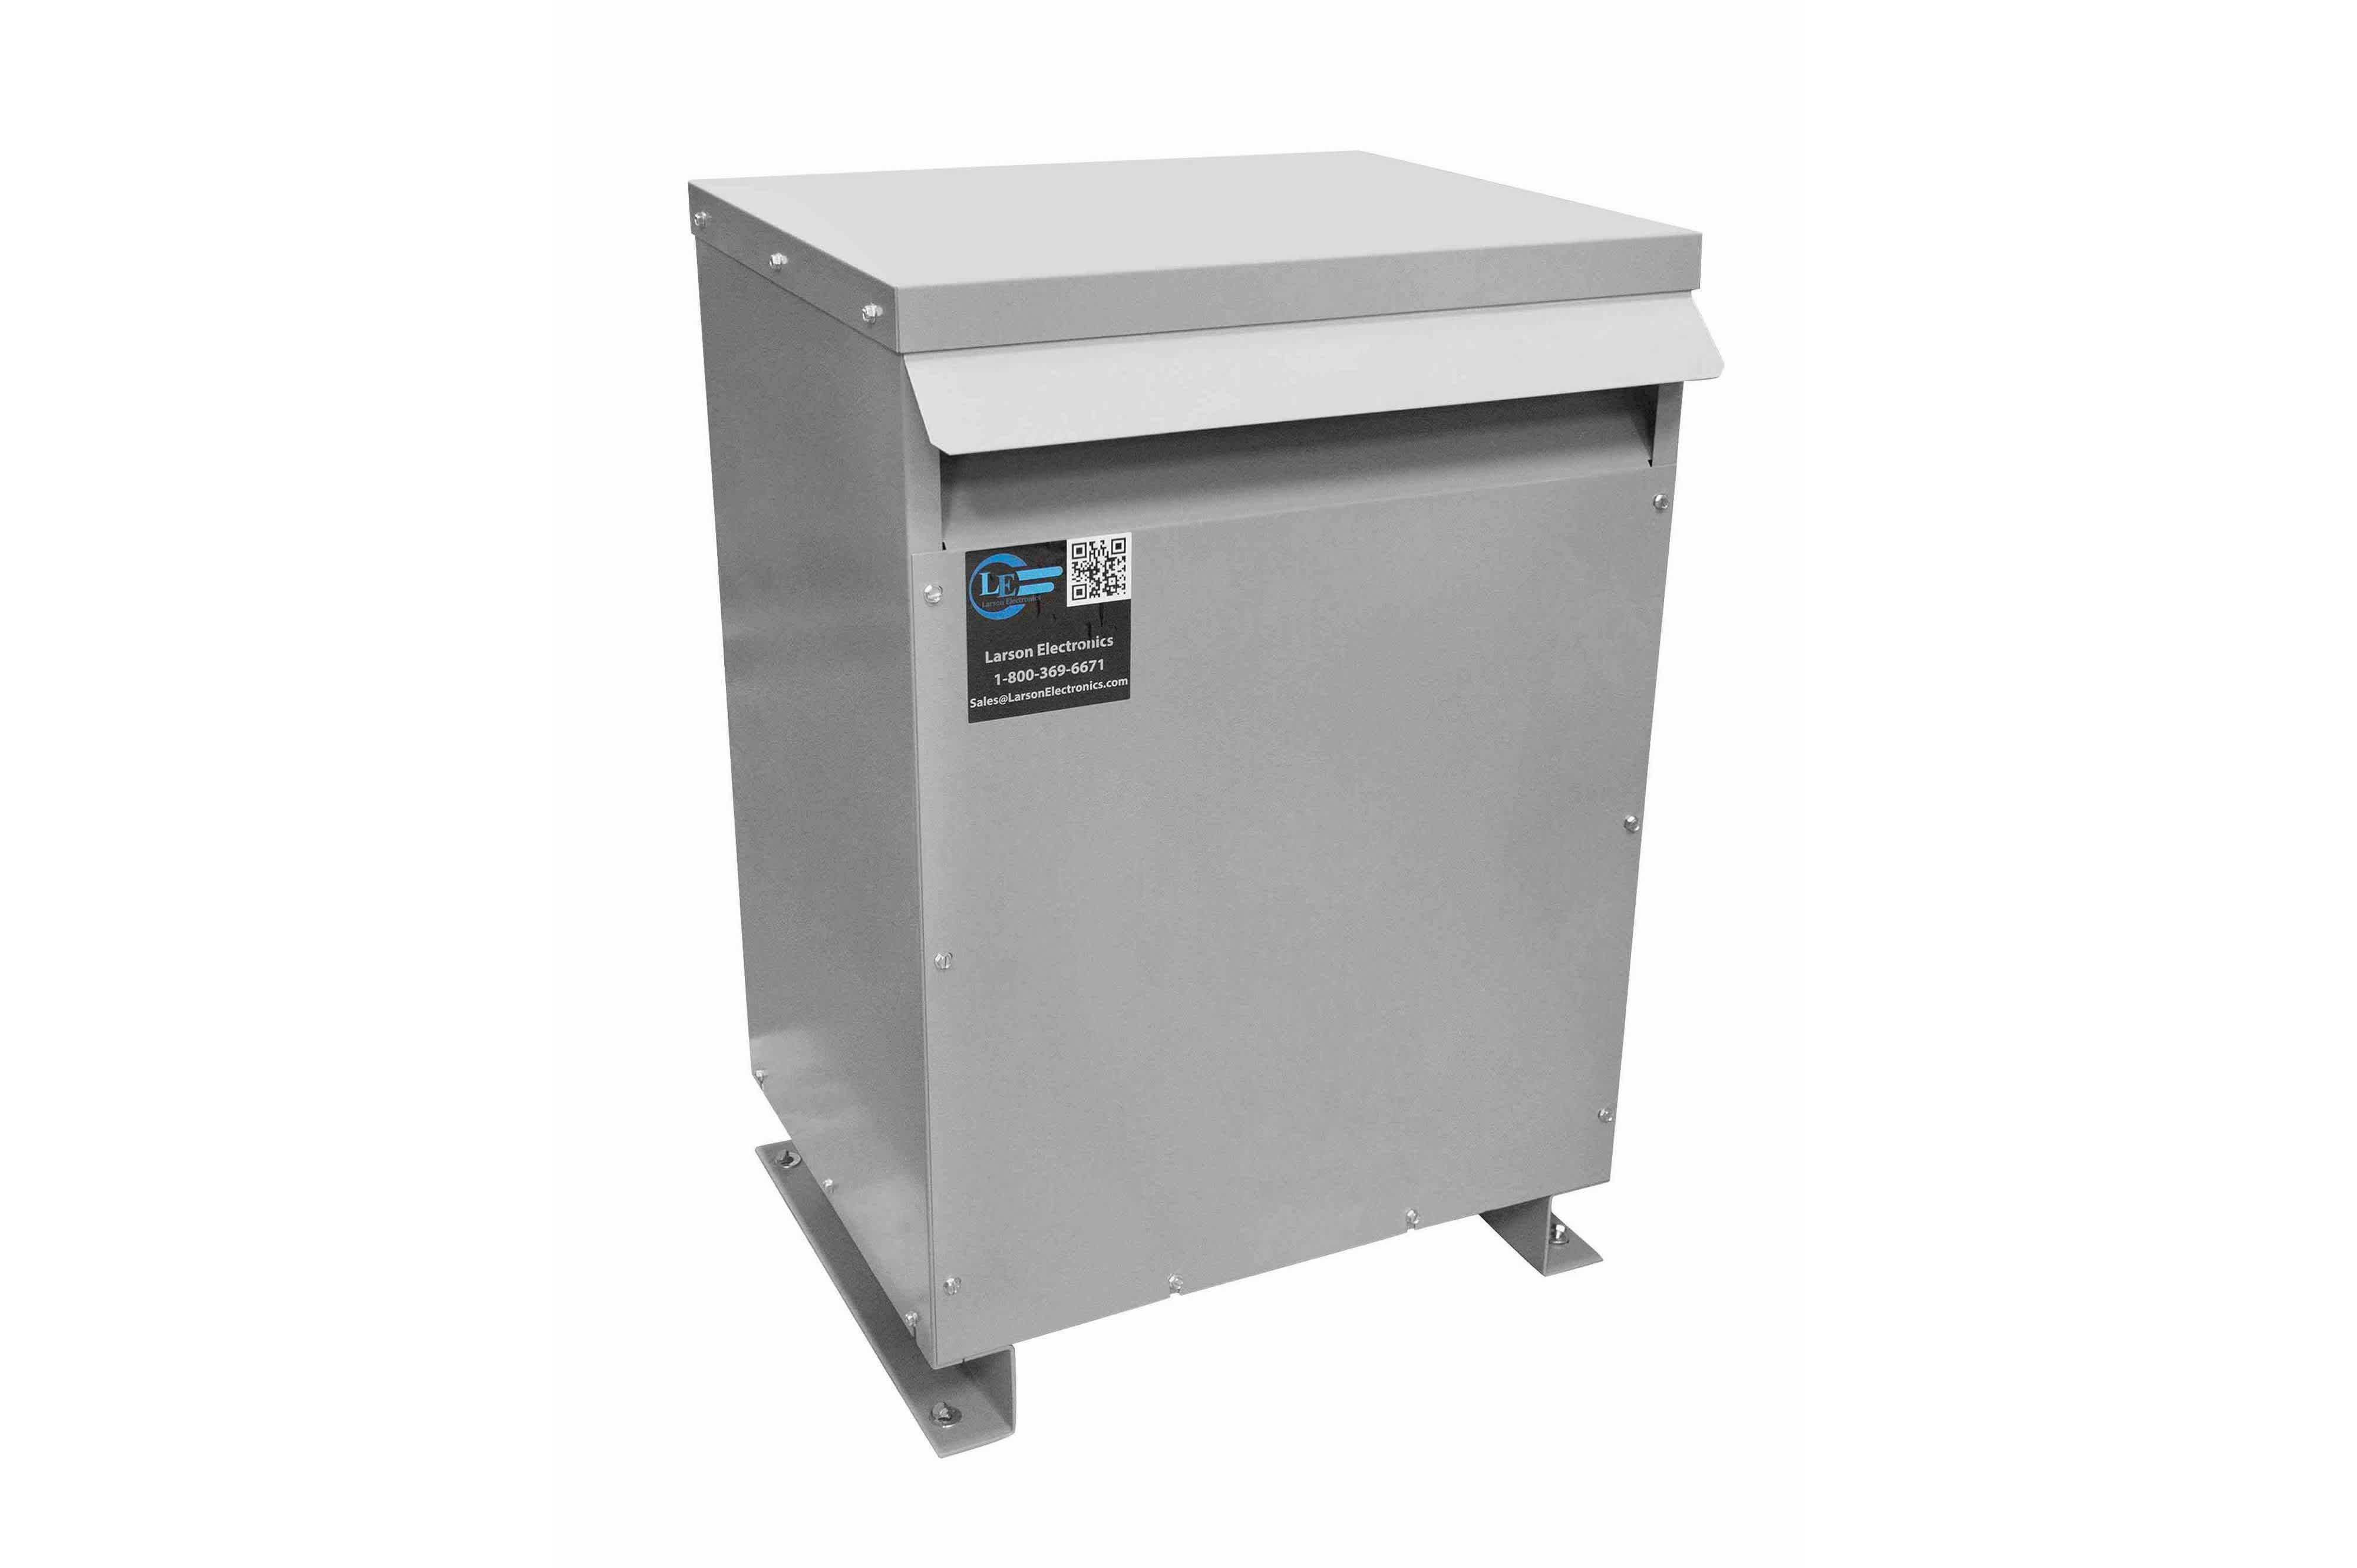 400 kVA 3PH Isolation Transformer, 220V Wye Primary, 208Y/120 Wye-N Secondary, N3R, Ventilated, 60 Hz